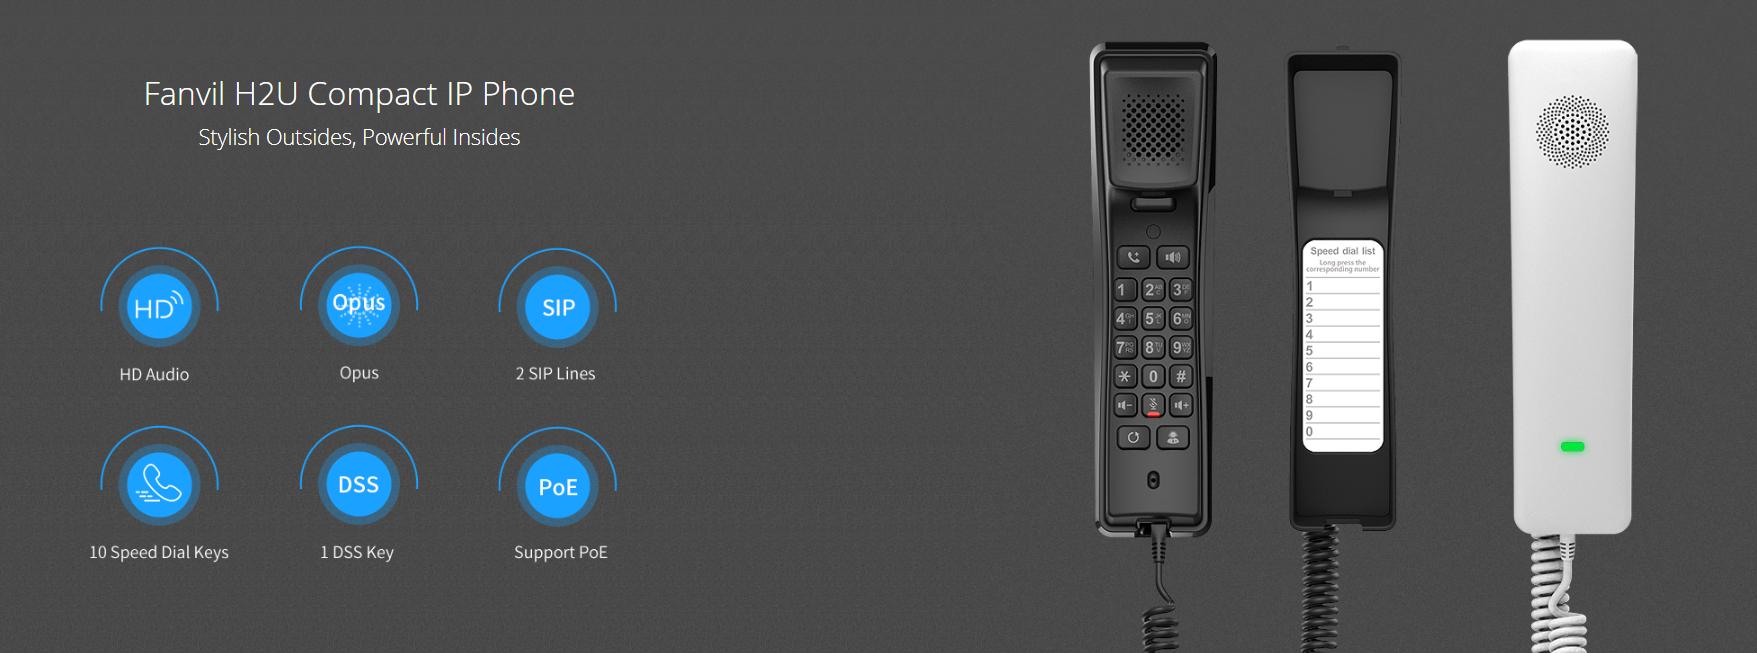 Fanvil H2U Compact IP Phone - Hong Kong Hotline : 39133533 - Fanvil Hong Kong - 香港代理